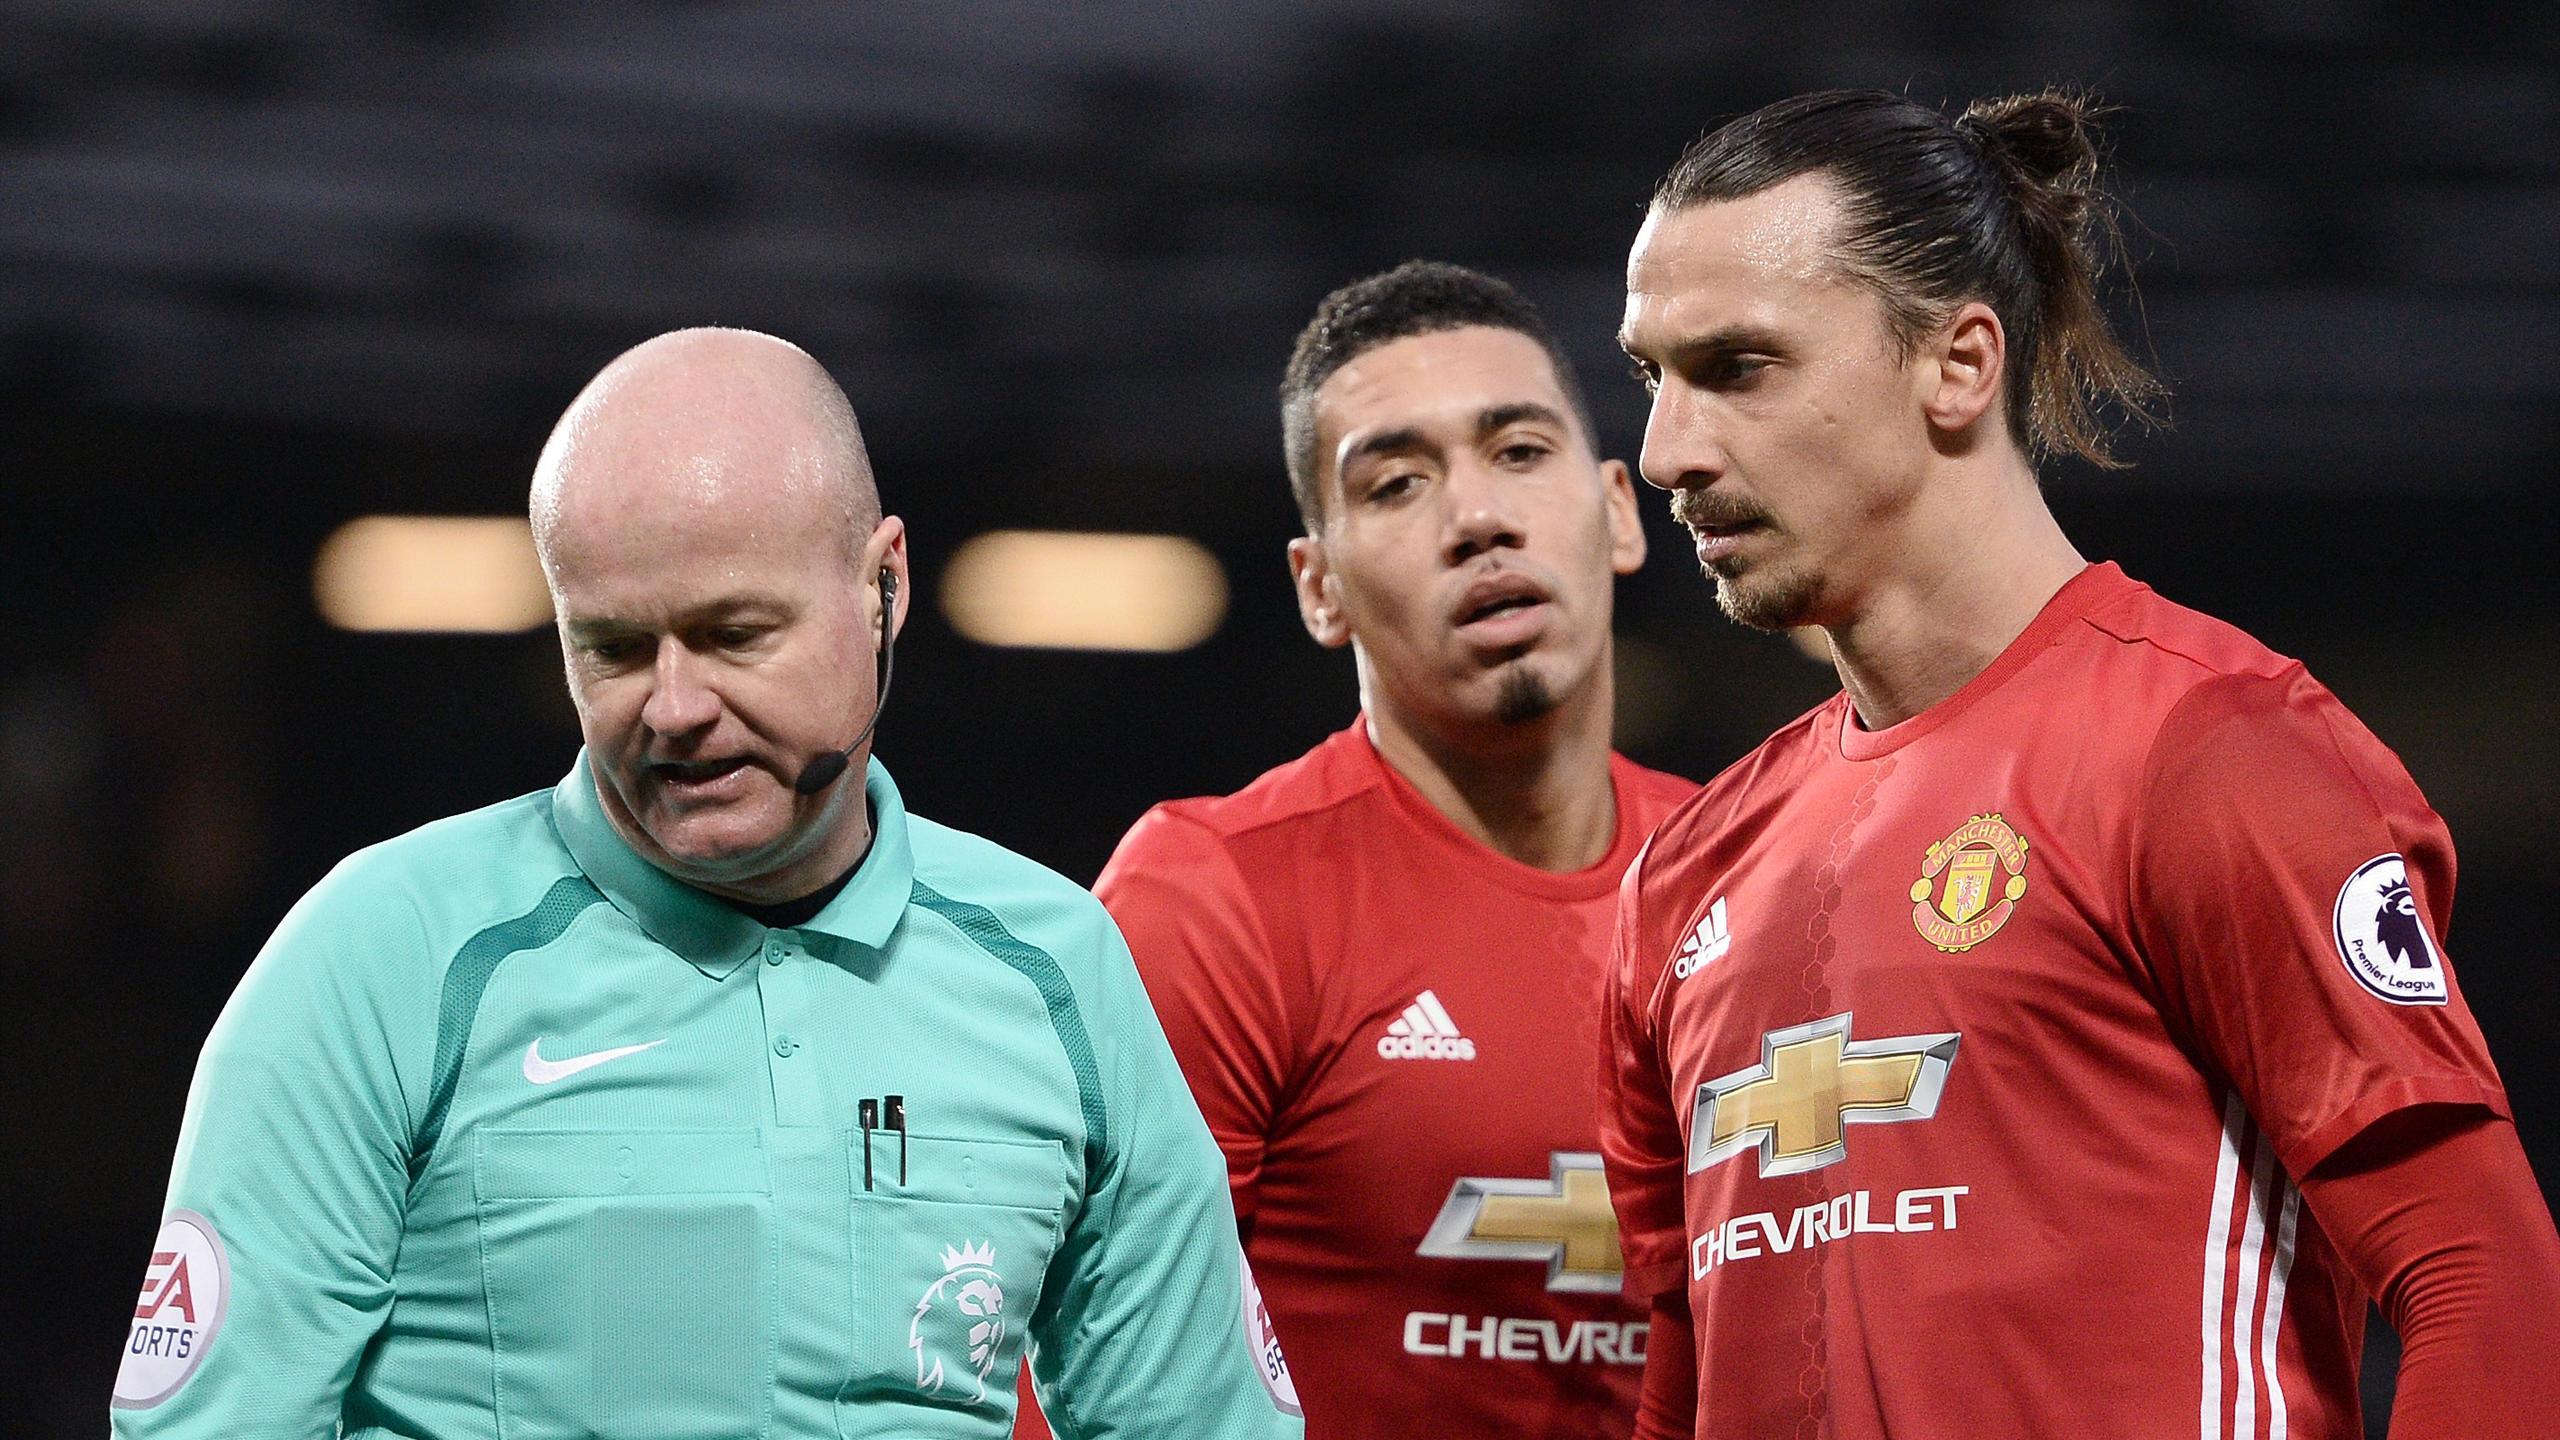 Manchester United's Swedish striker Zlatan Ibrahimovic (R) remonstrates with English referee Lee Mason